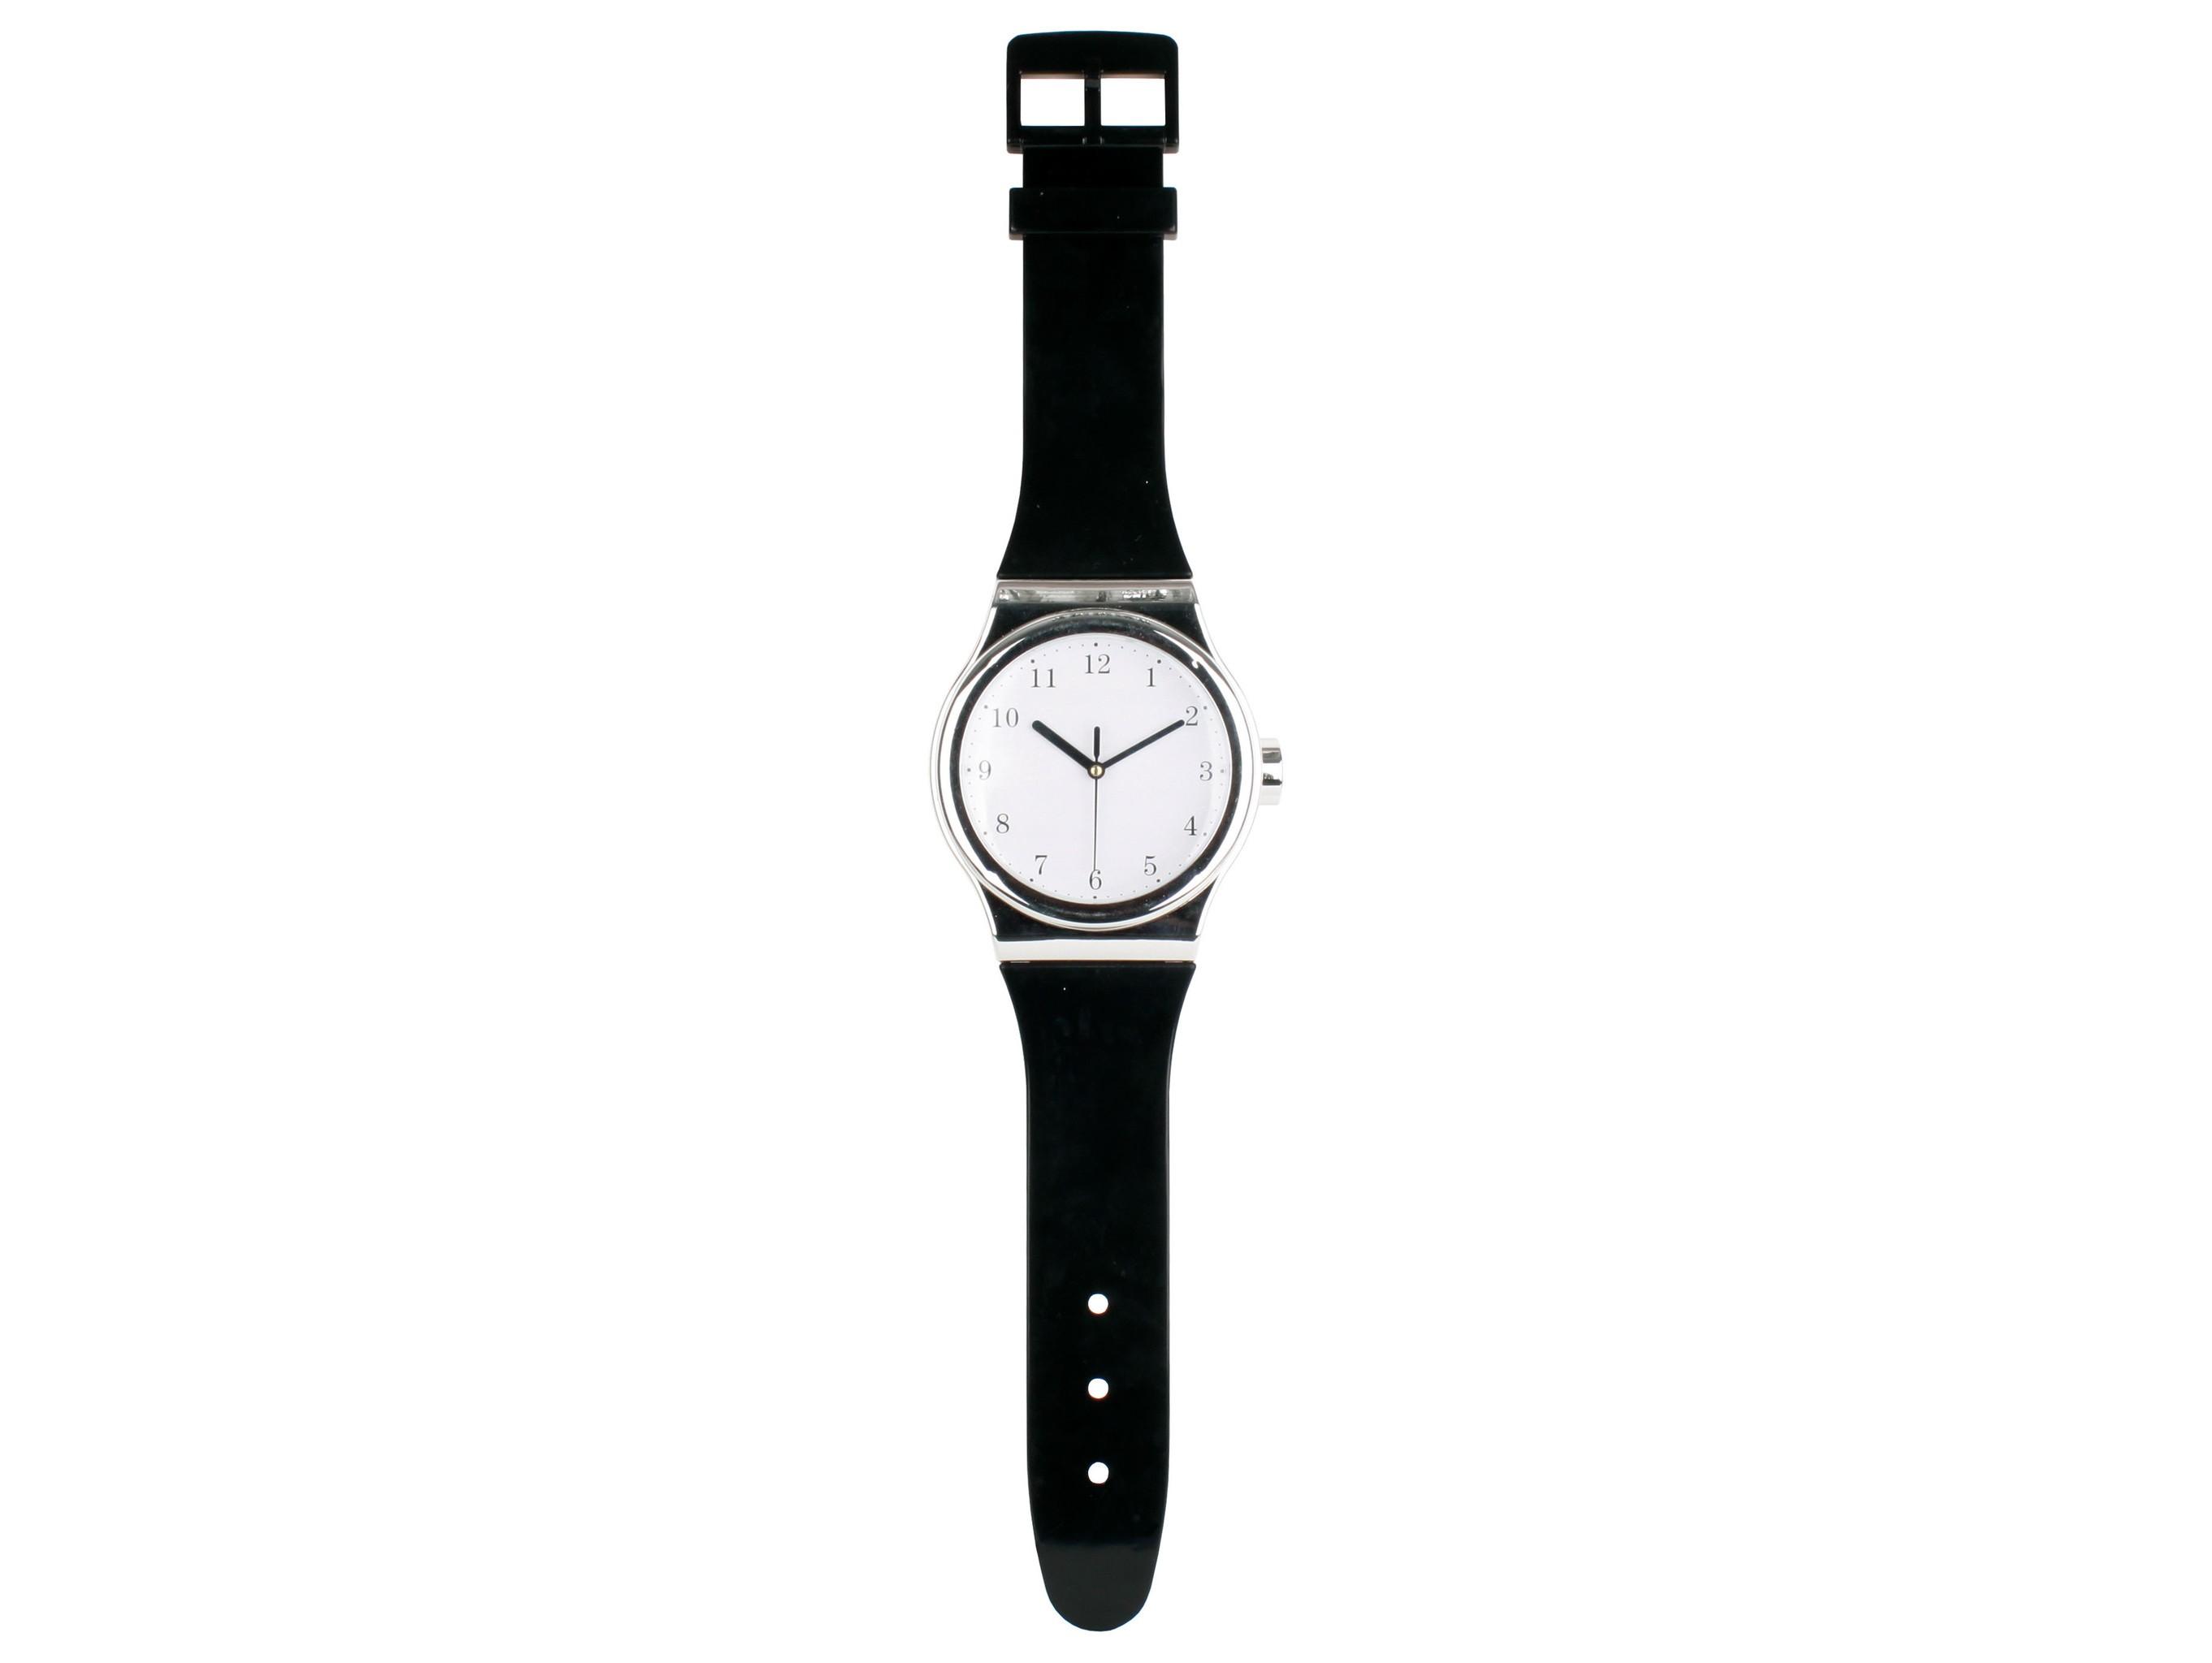 Часы настенные AriaНастенные часы<br>Кварцевый механизм<br><br>Material: Пластик<br>Width см: 20<br>Depth см: 5<br>Height см: 92